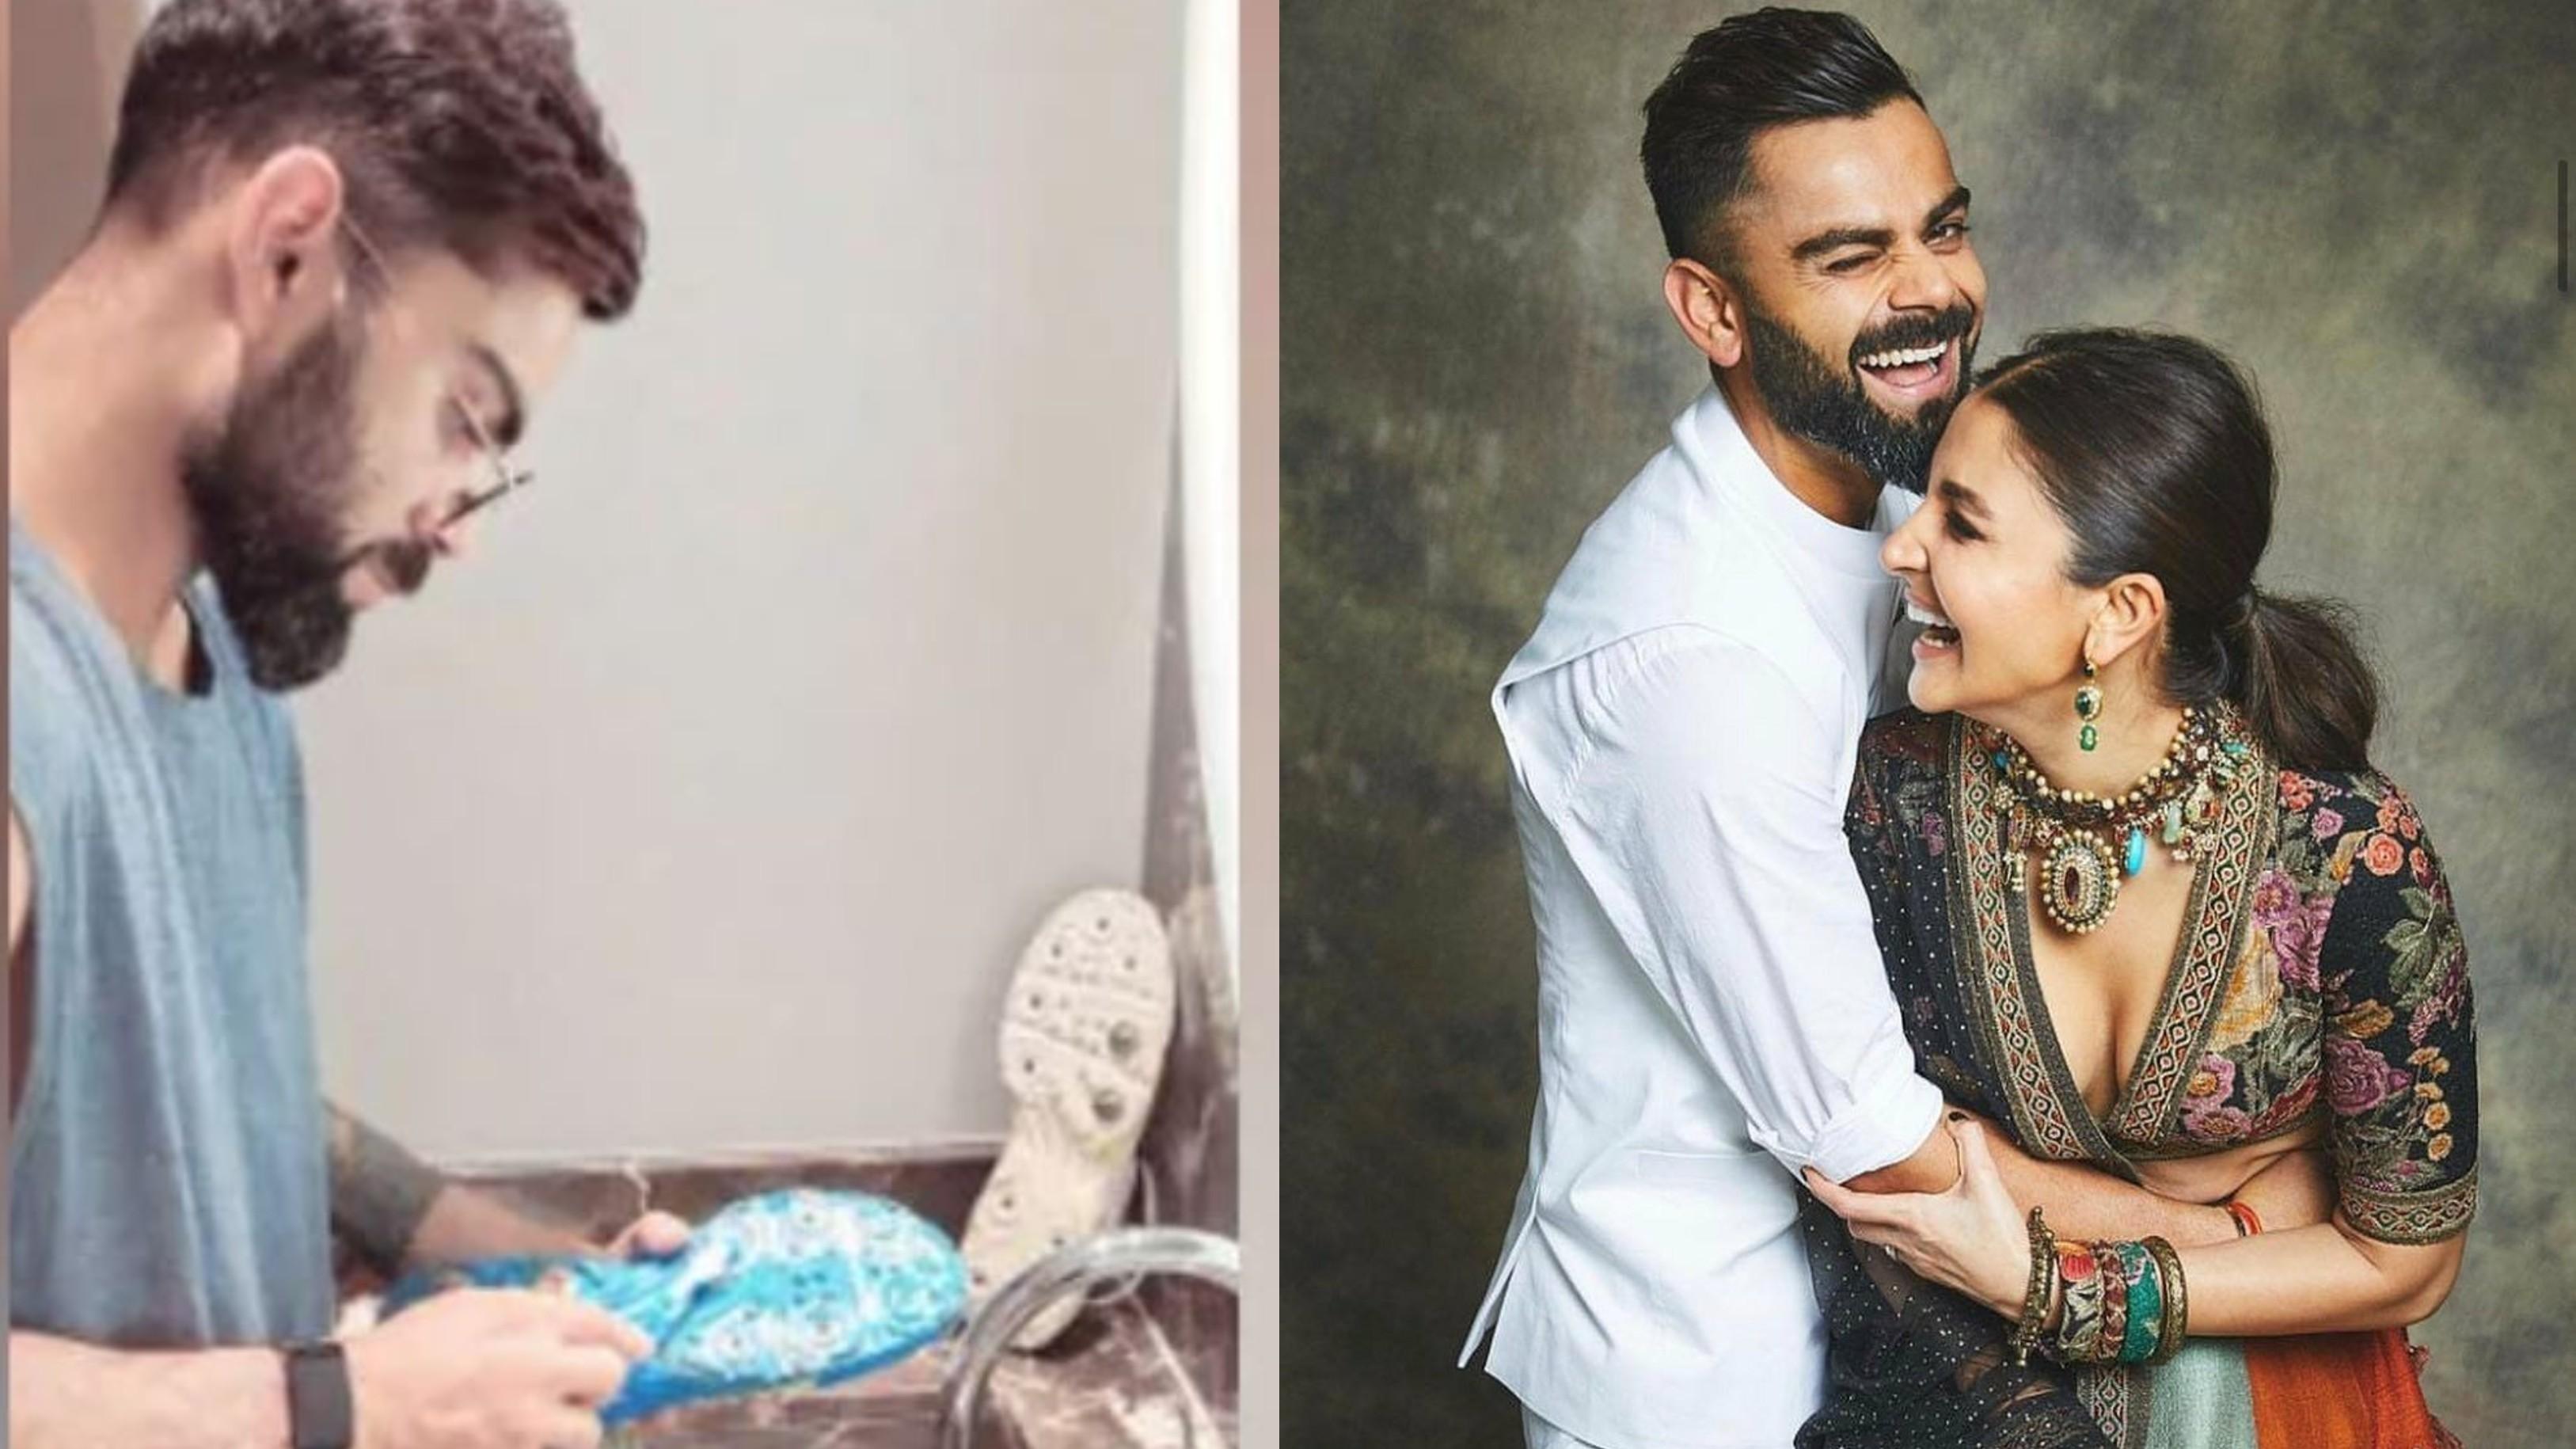 Anushka Sharma catches husband Virat Kohli